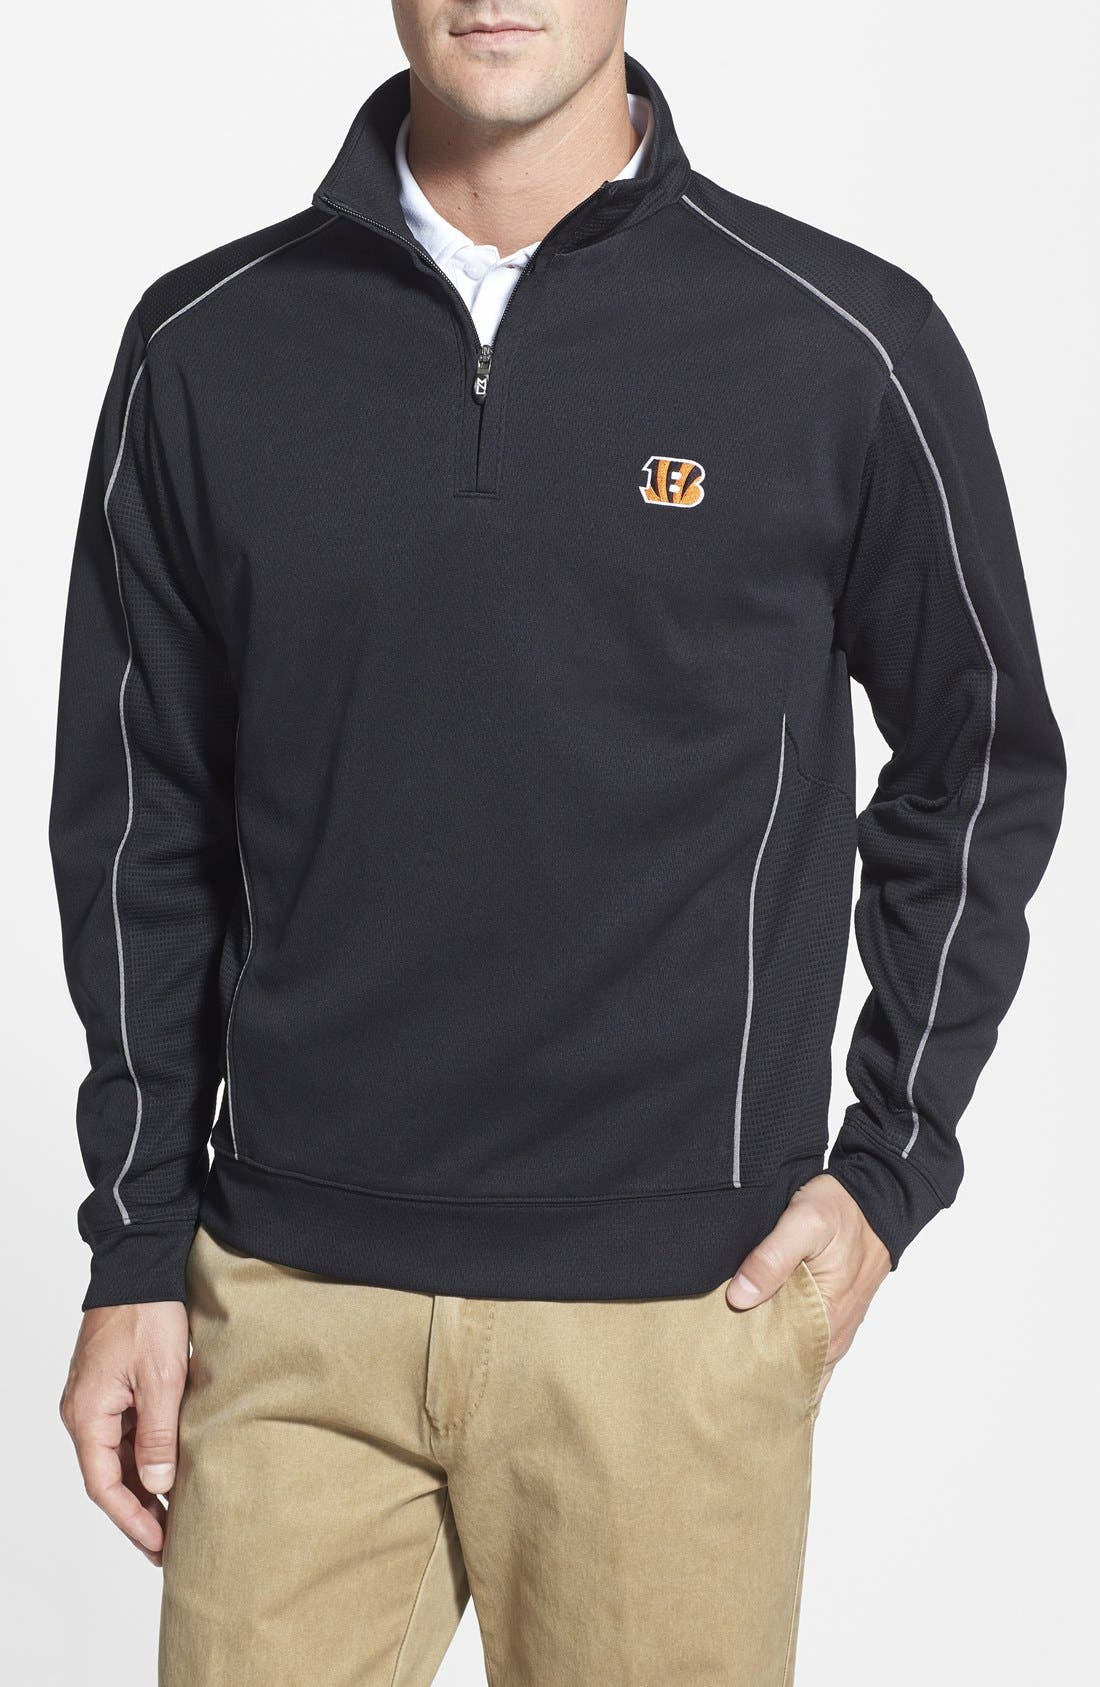 Cincinnati Bengals - Edge DryTec Moisture Wicking Half Zip Pullover,                             Main thumbnail 1, color,                             Black